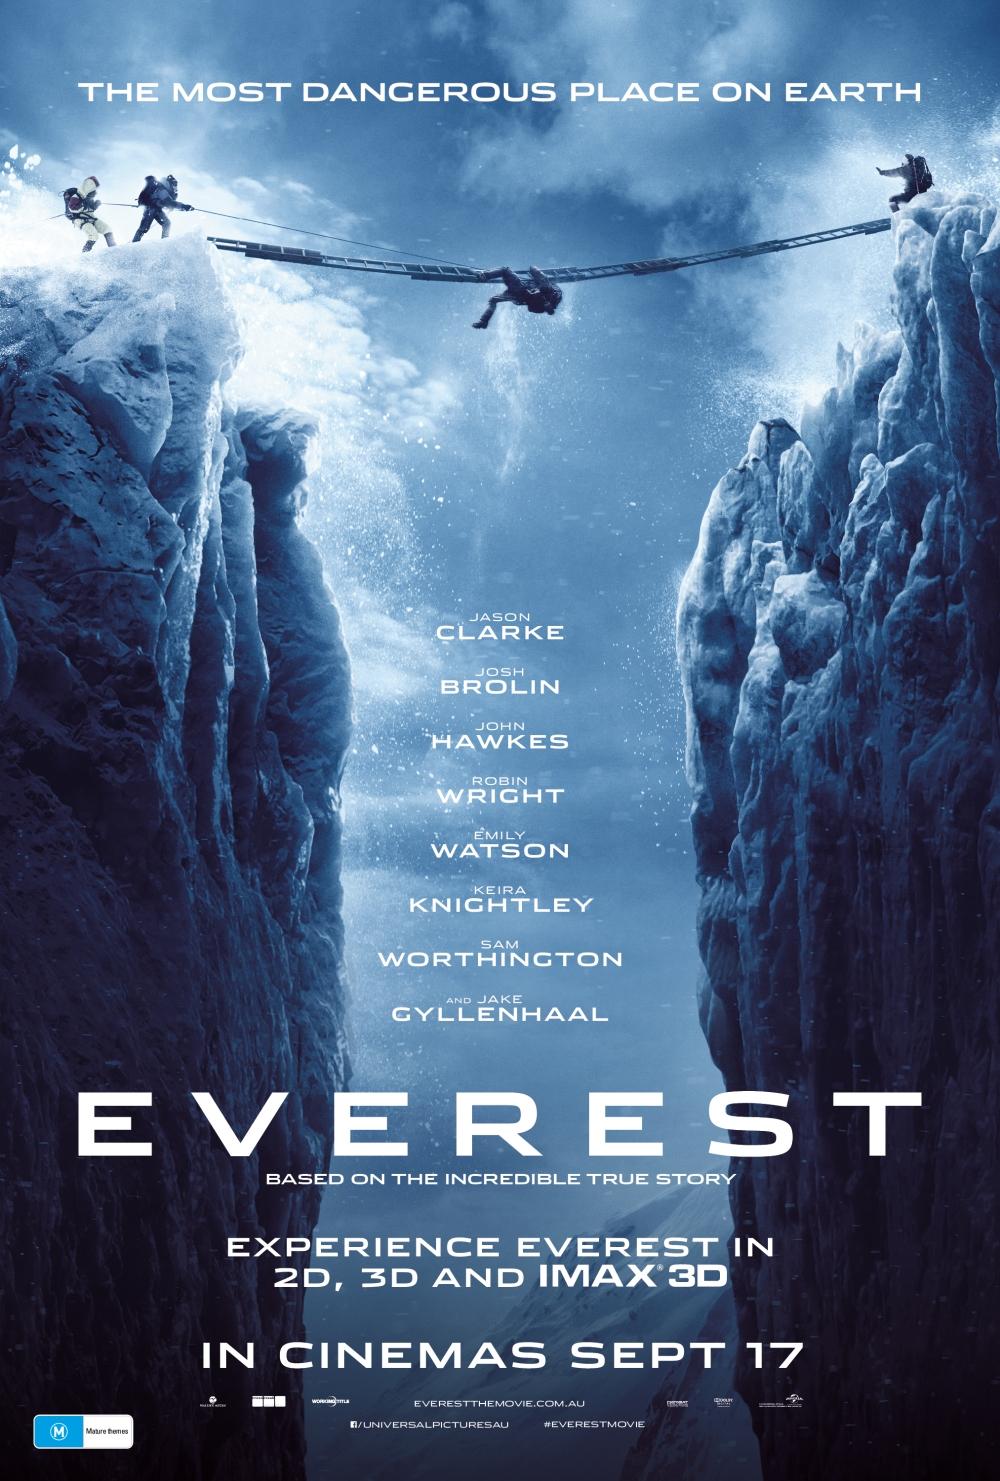 Everest_1Sheet_Action_KeyArt_HiRes (1)